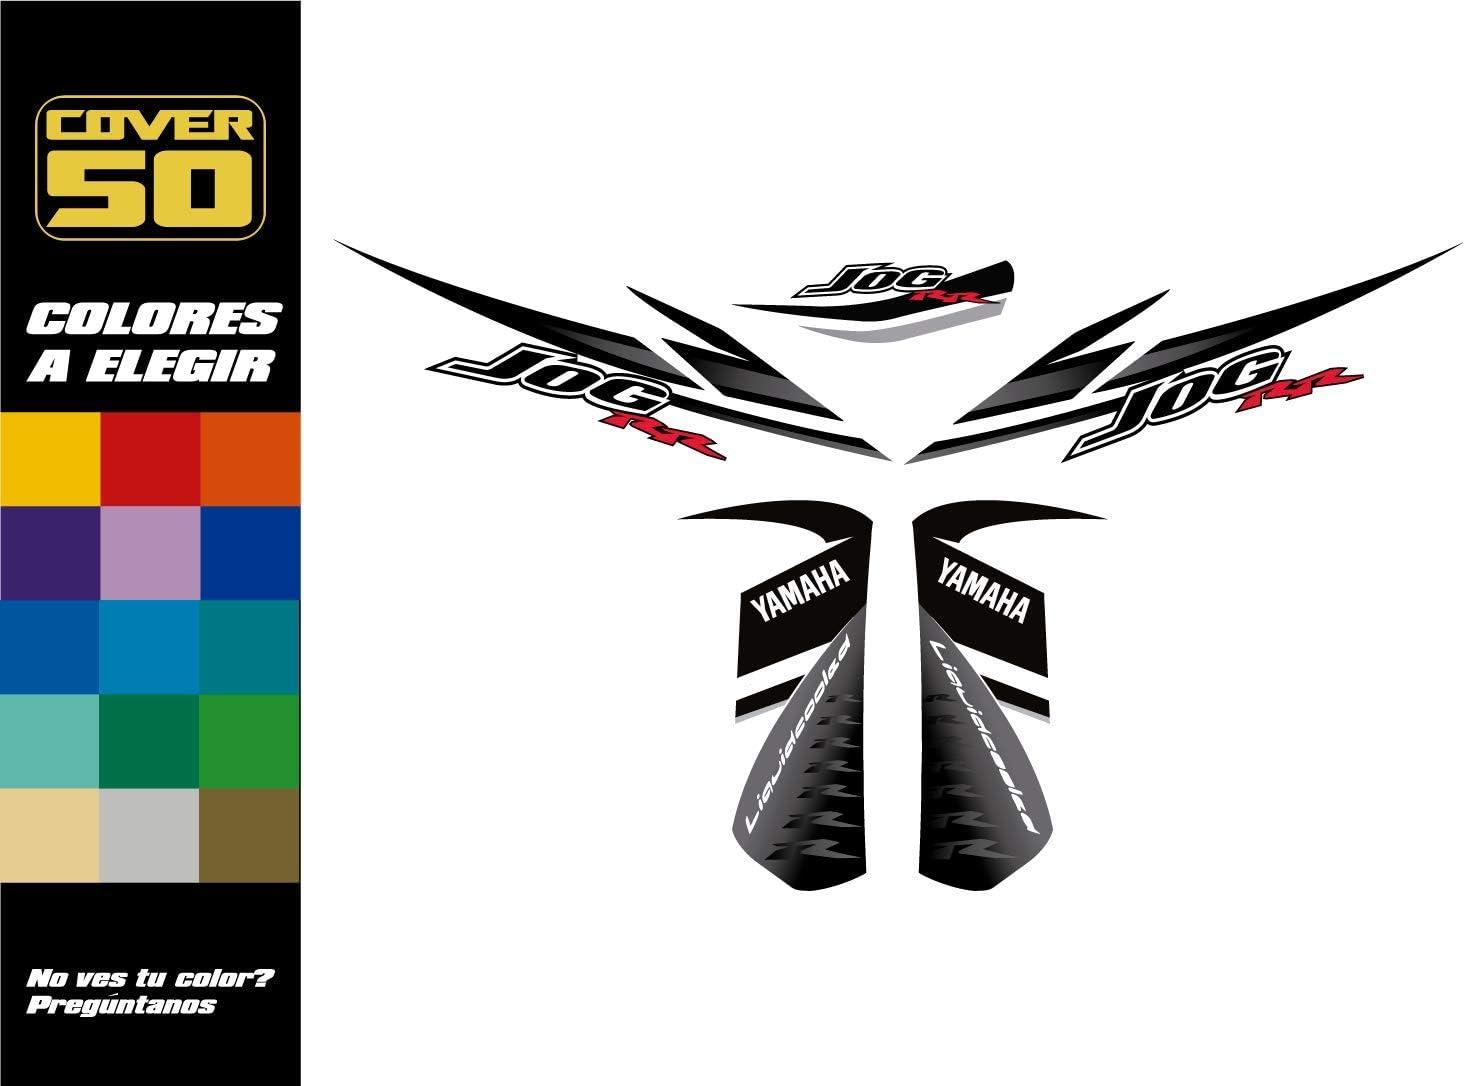 Kit Adhesivos Pegatinas Yamaha Jog - Replica Original - Colores Personalizados: Amazon.es: Hogar